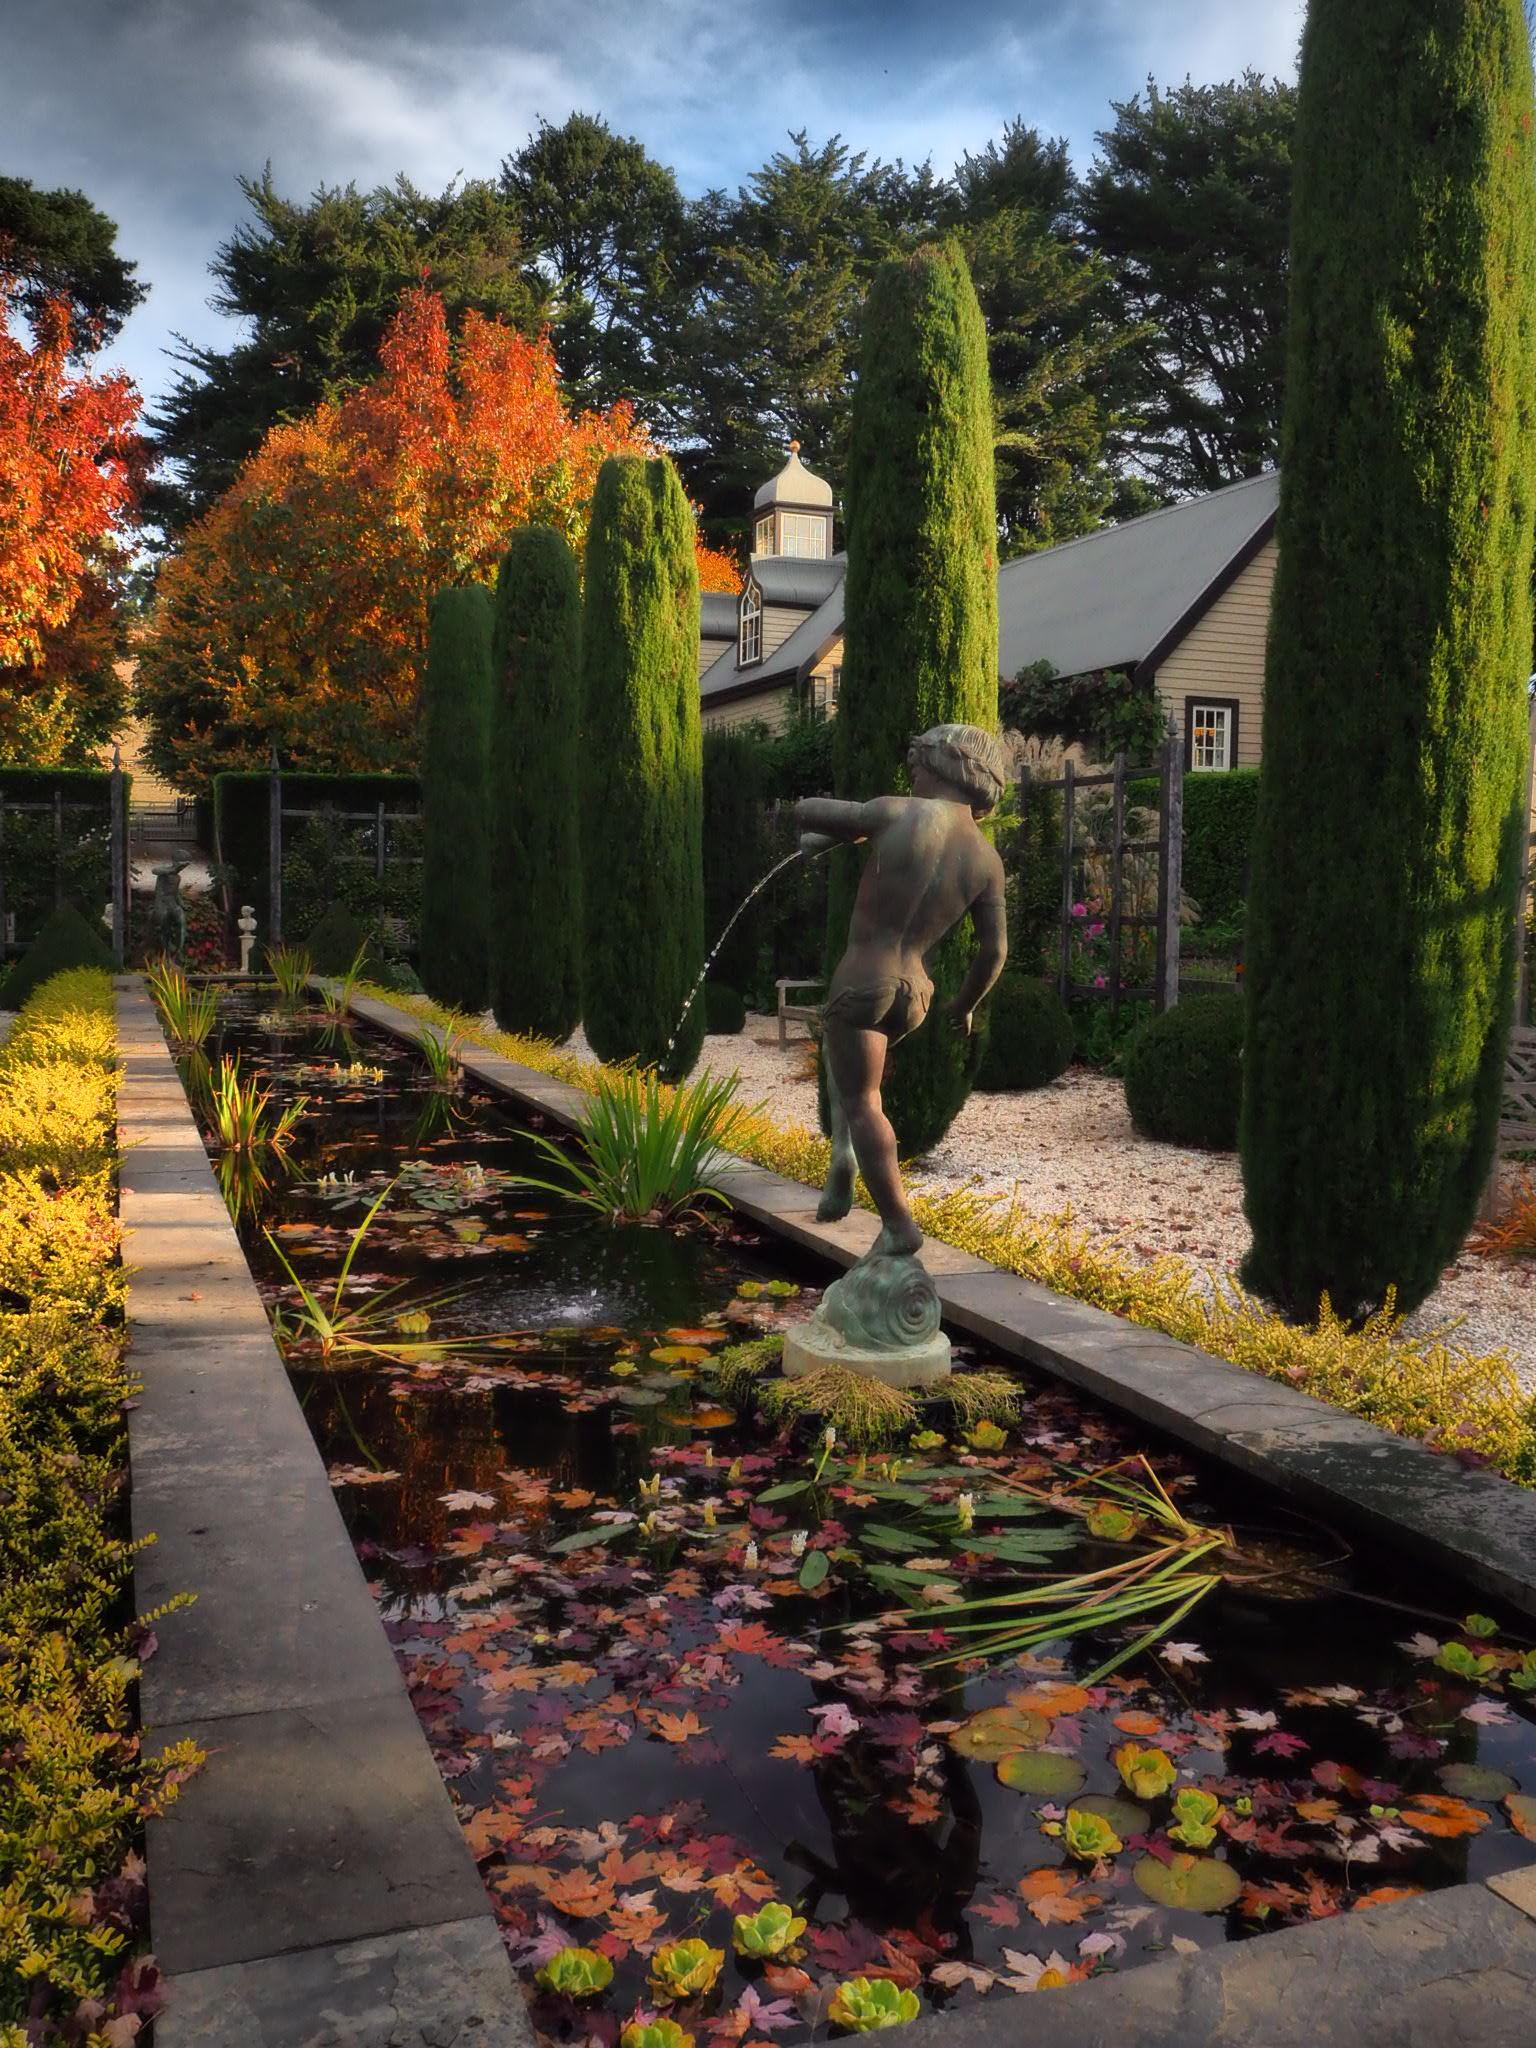 muskfarm_tank_garden_autumn_english_garden_IMG_3392.JPG